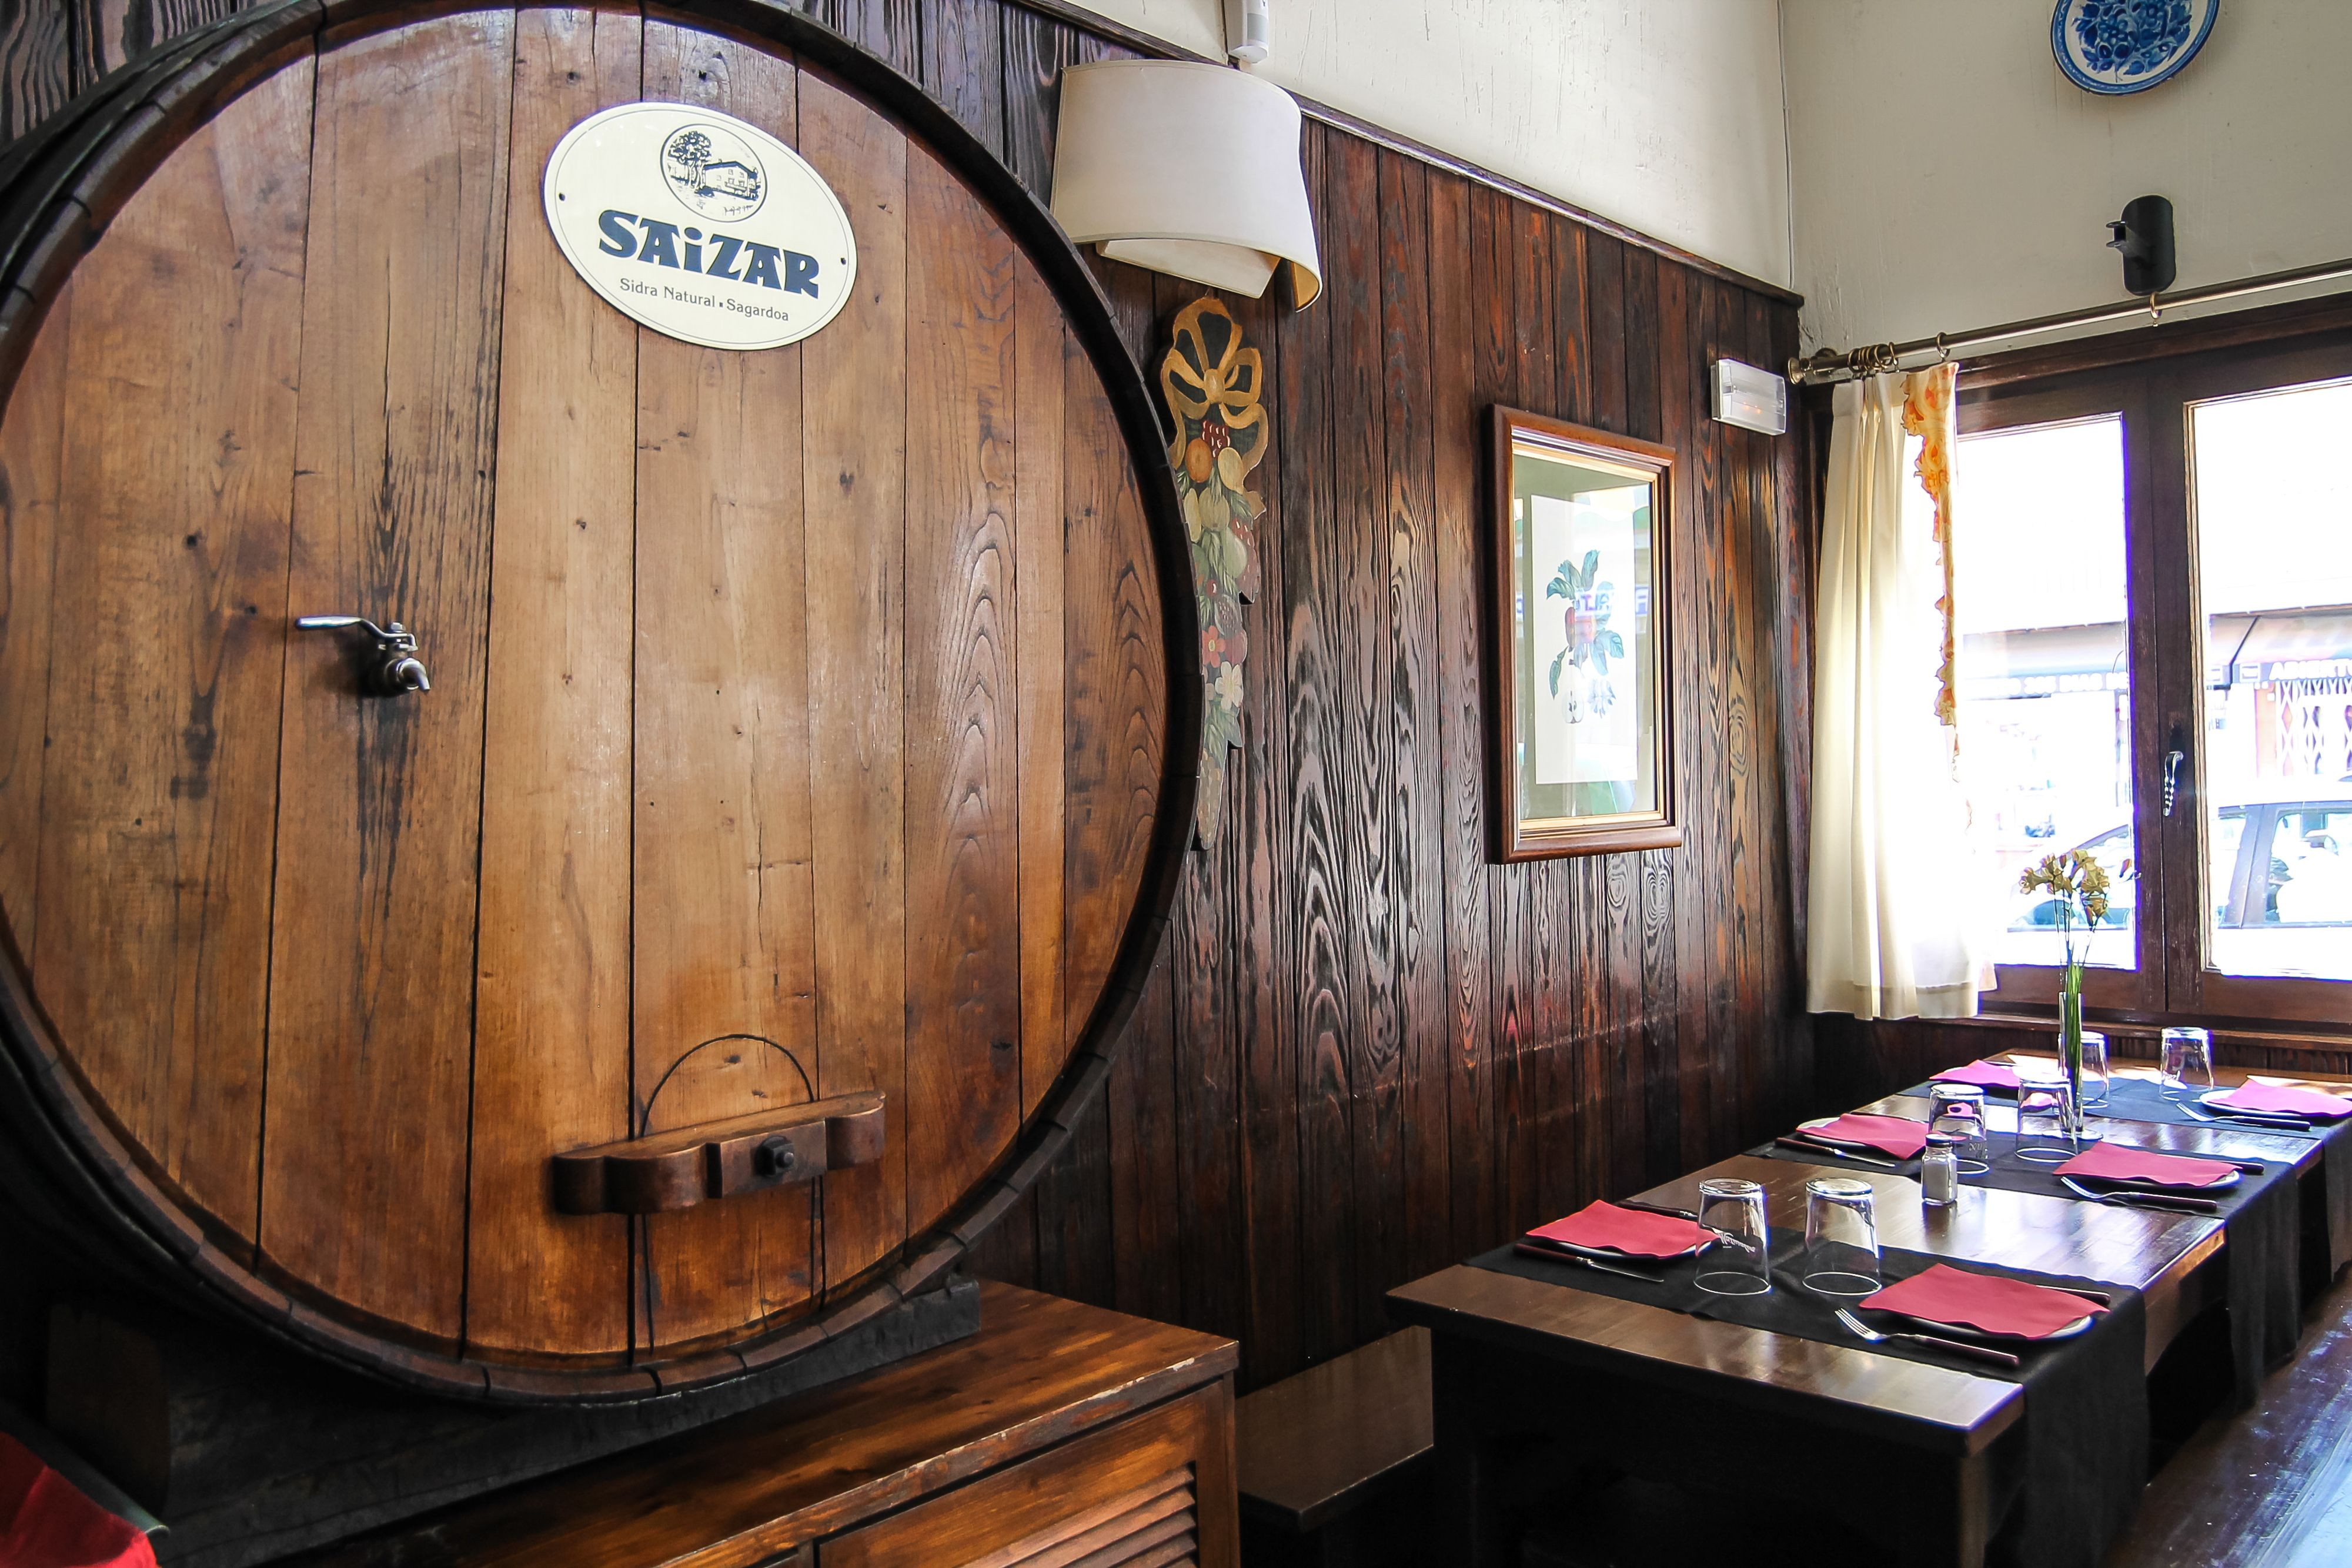 Foto 4 de Cocina vasca en Guadarrama | Sidrería Vasca Gasteiz